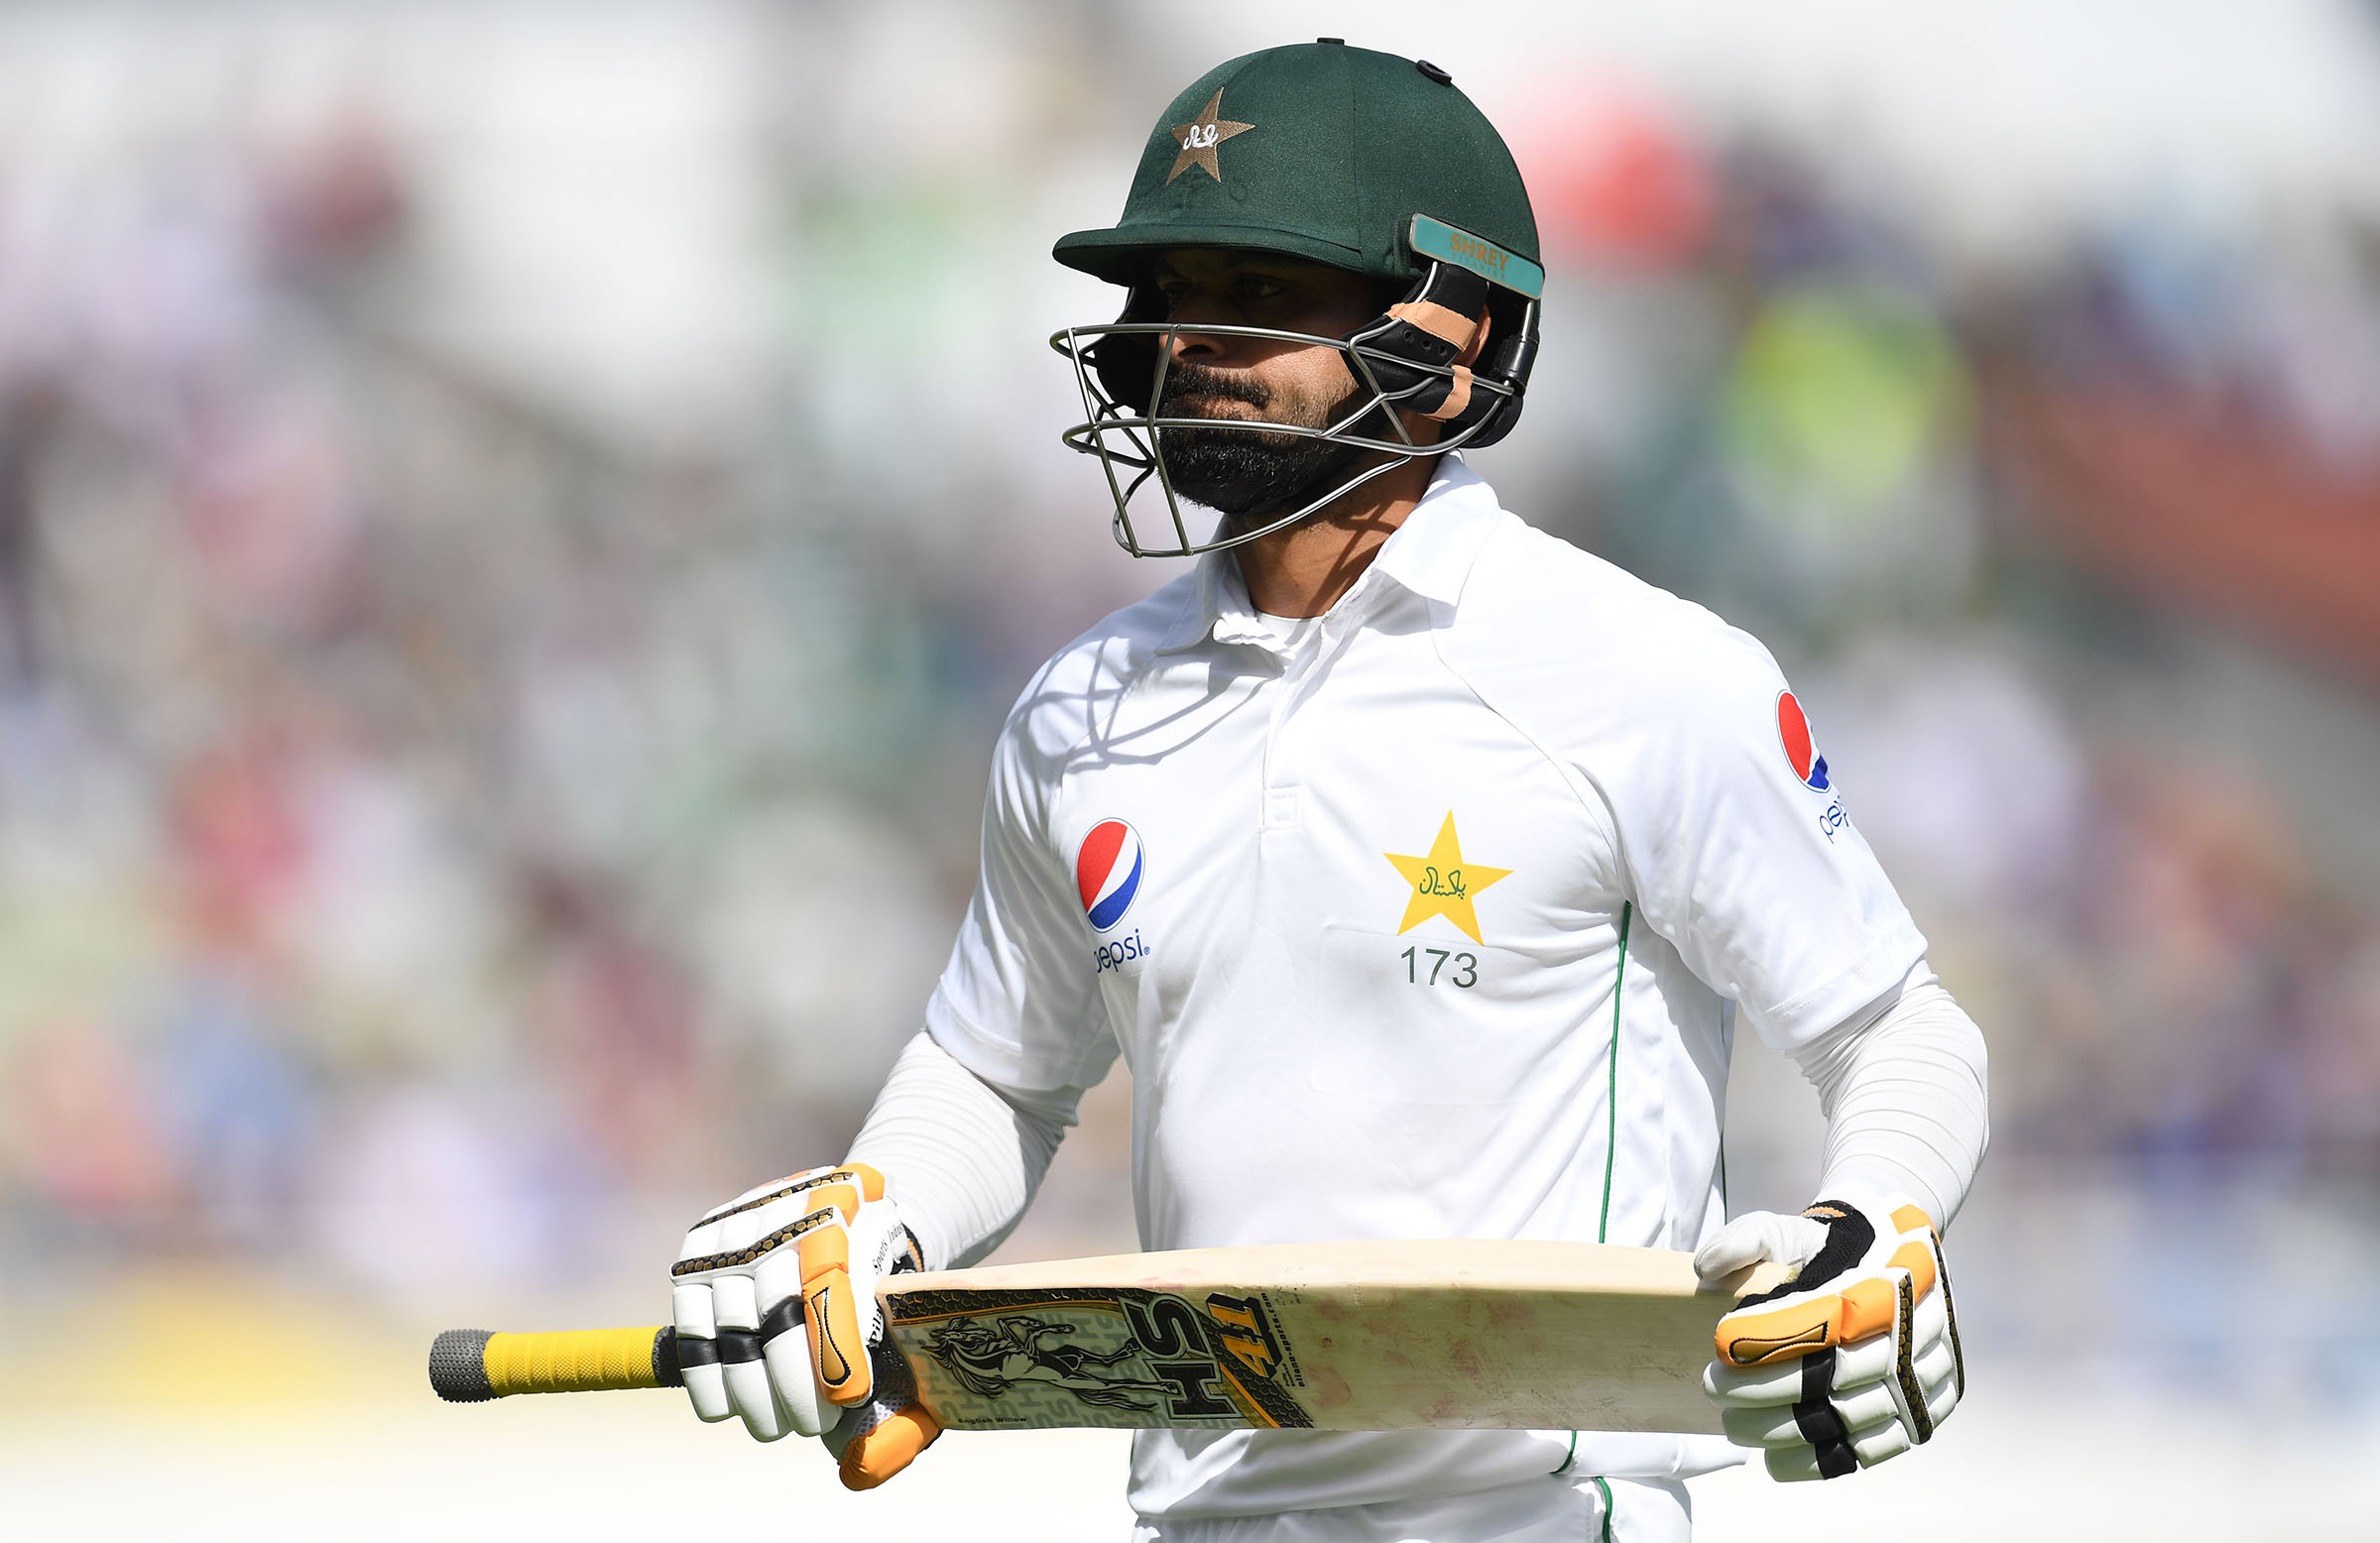 Hafeez returns to Pakistan team for Australia Test series